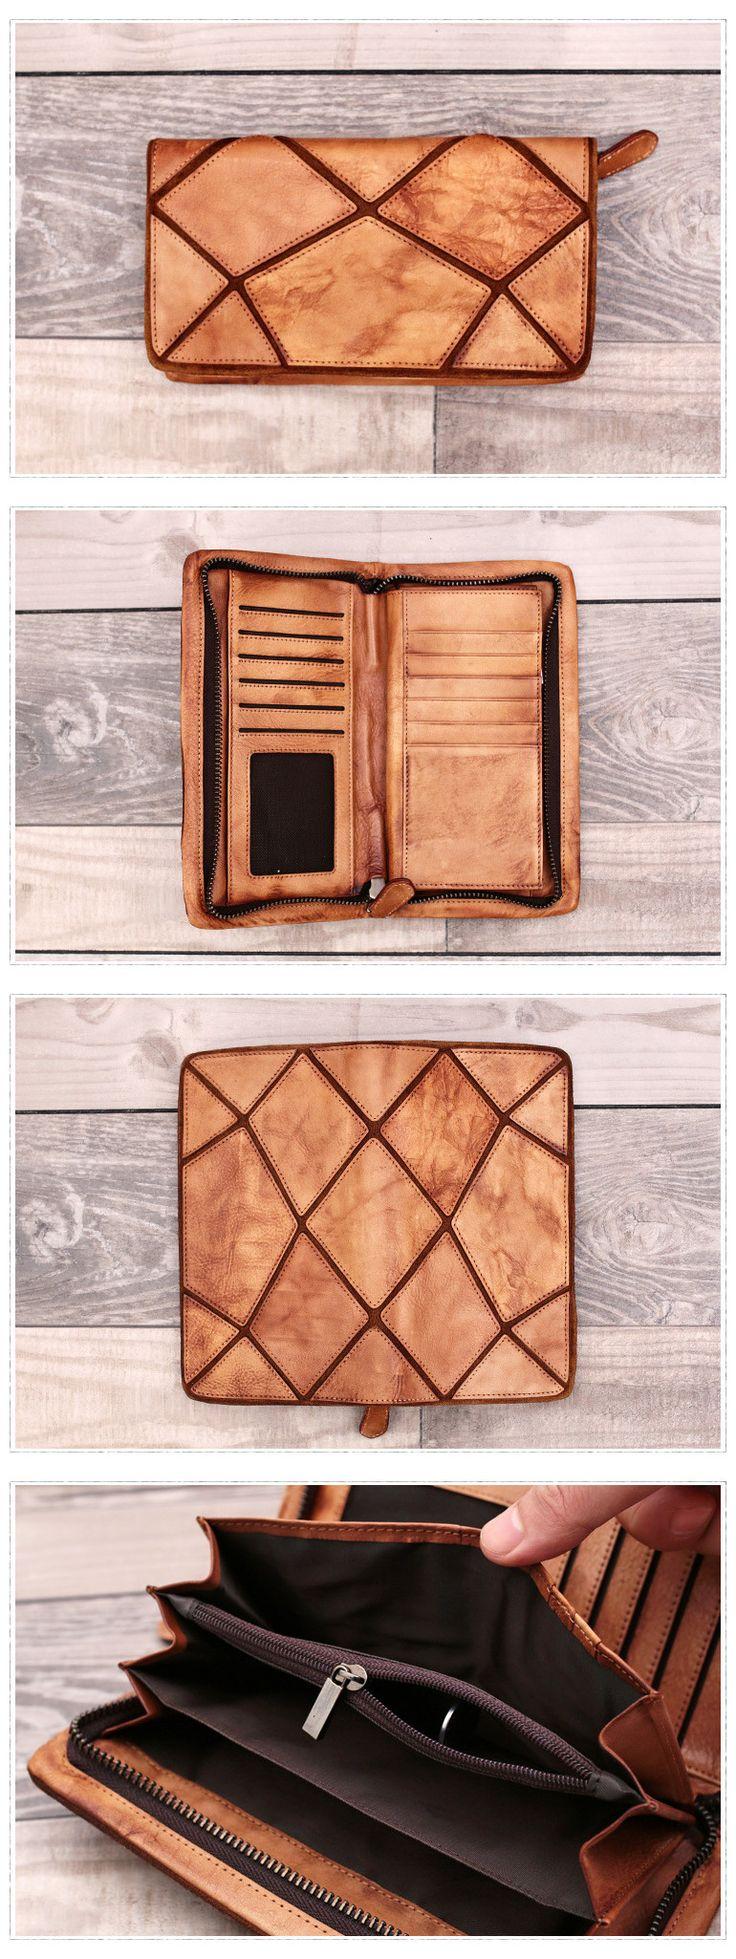 Genuine Leather Wallet Long Wallet Men Wallet Card Holder Dimensions: Length: 20 cm; Height: 11.5cm Color: Brown/Grey